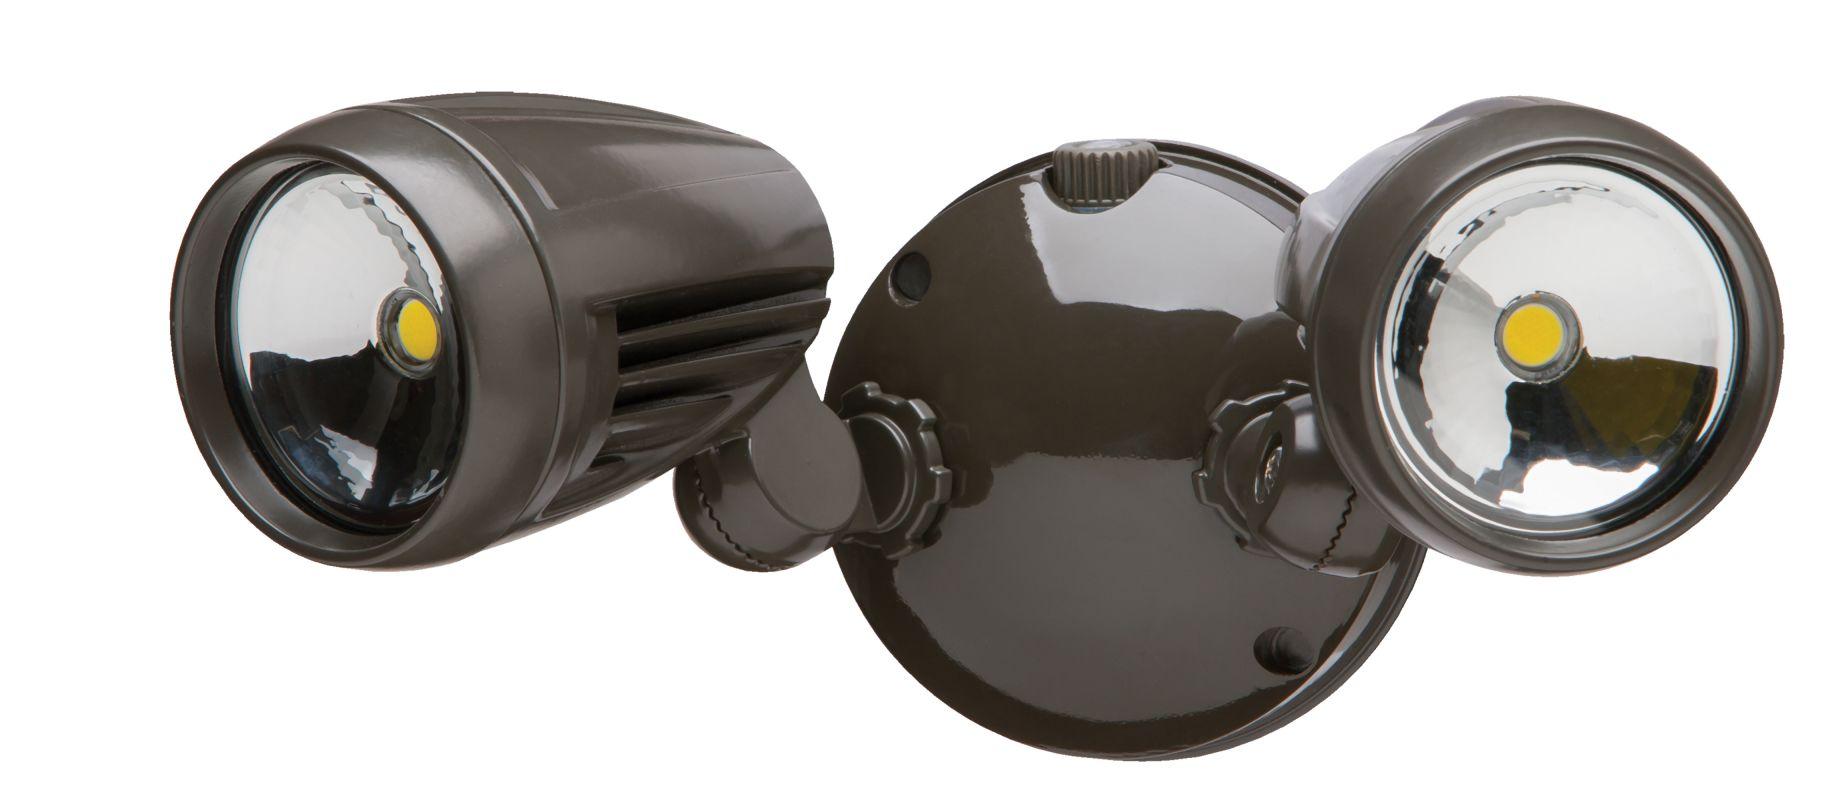 Heath Zenith Hz 8486 Bz A Bronze Led Dual Head Automatic